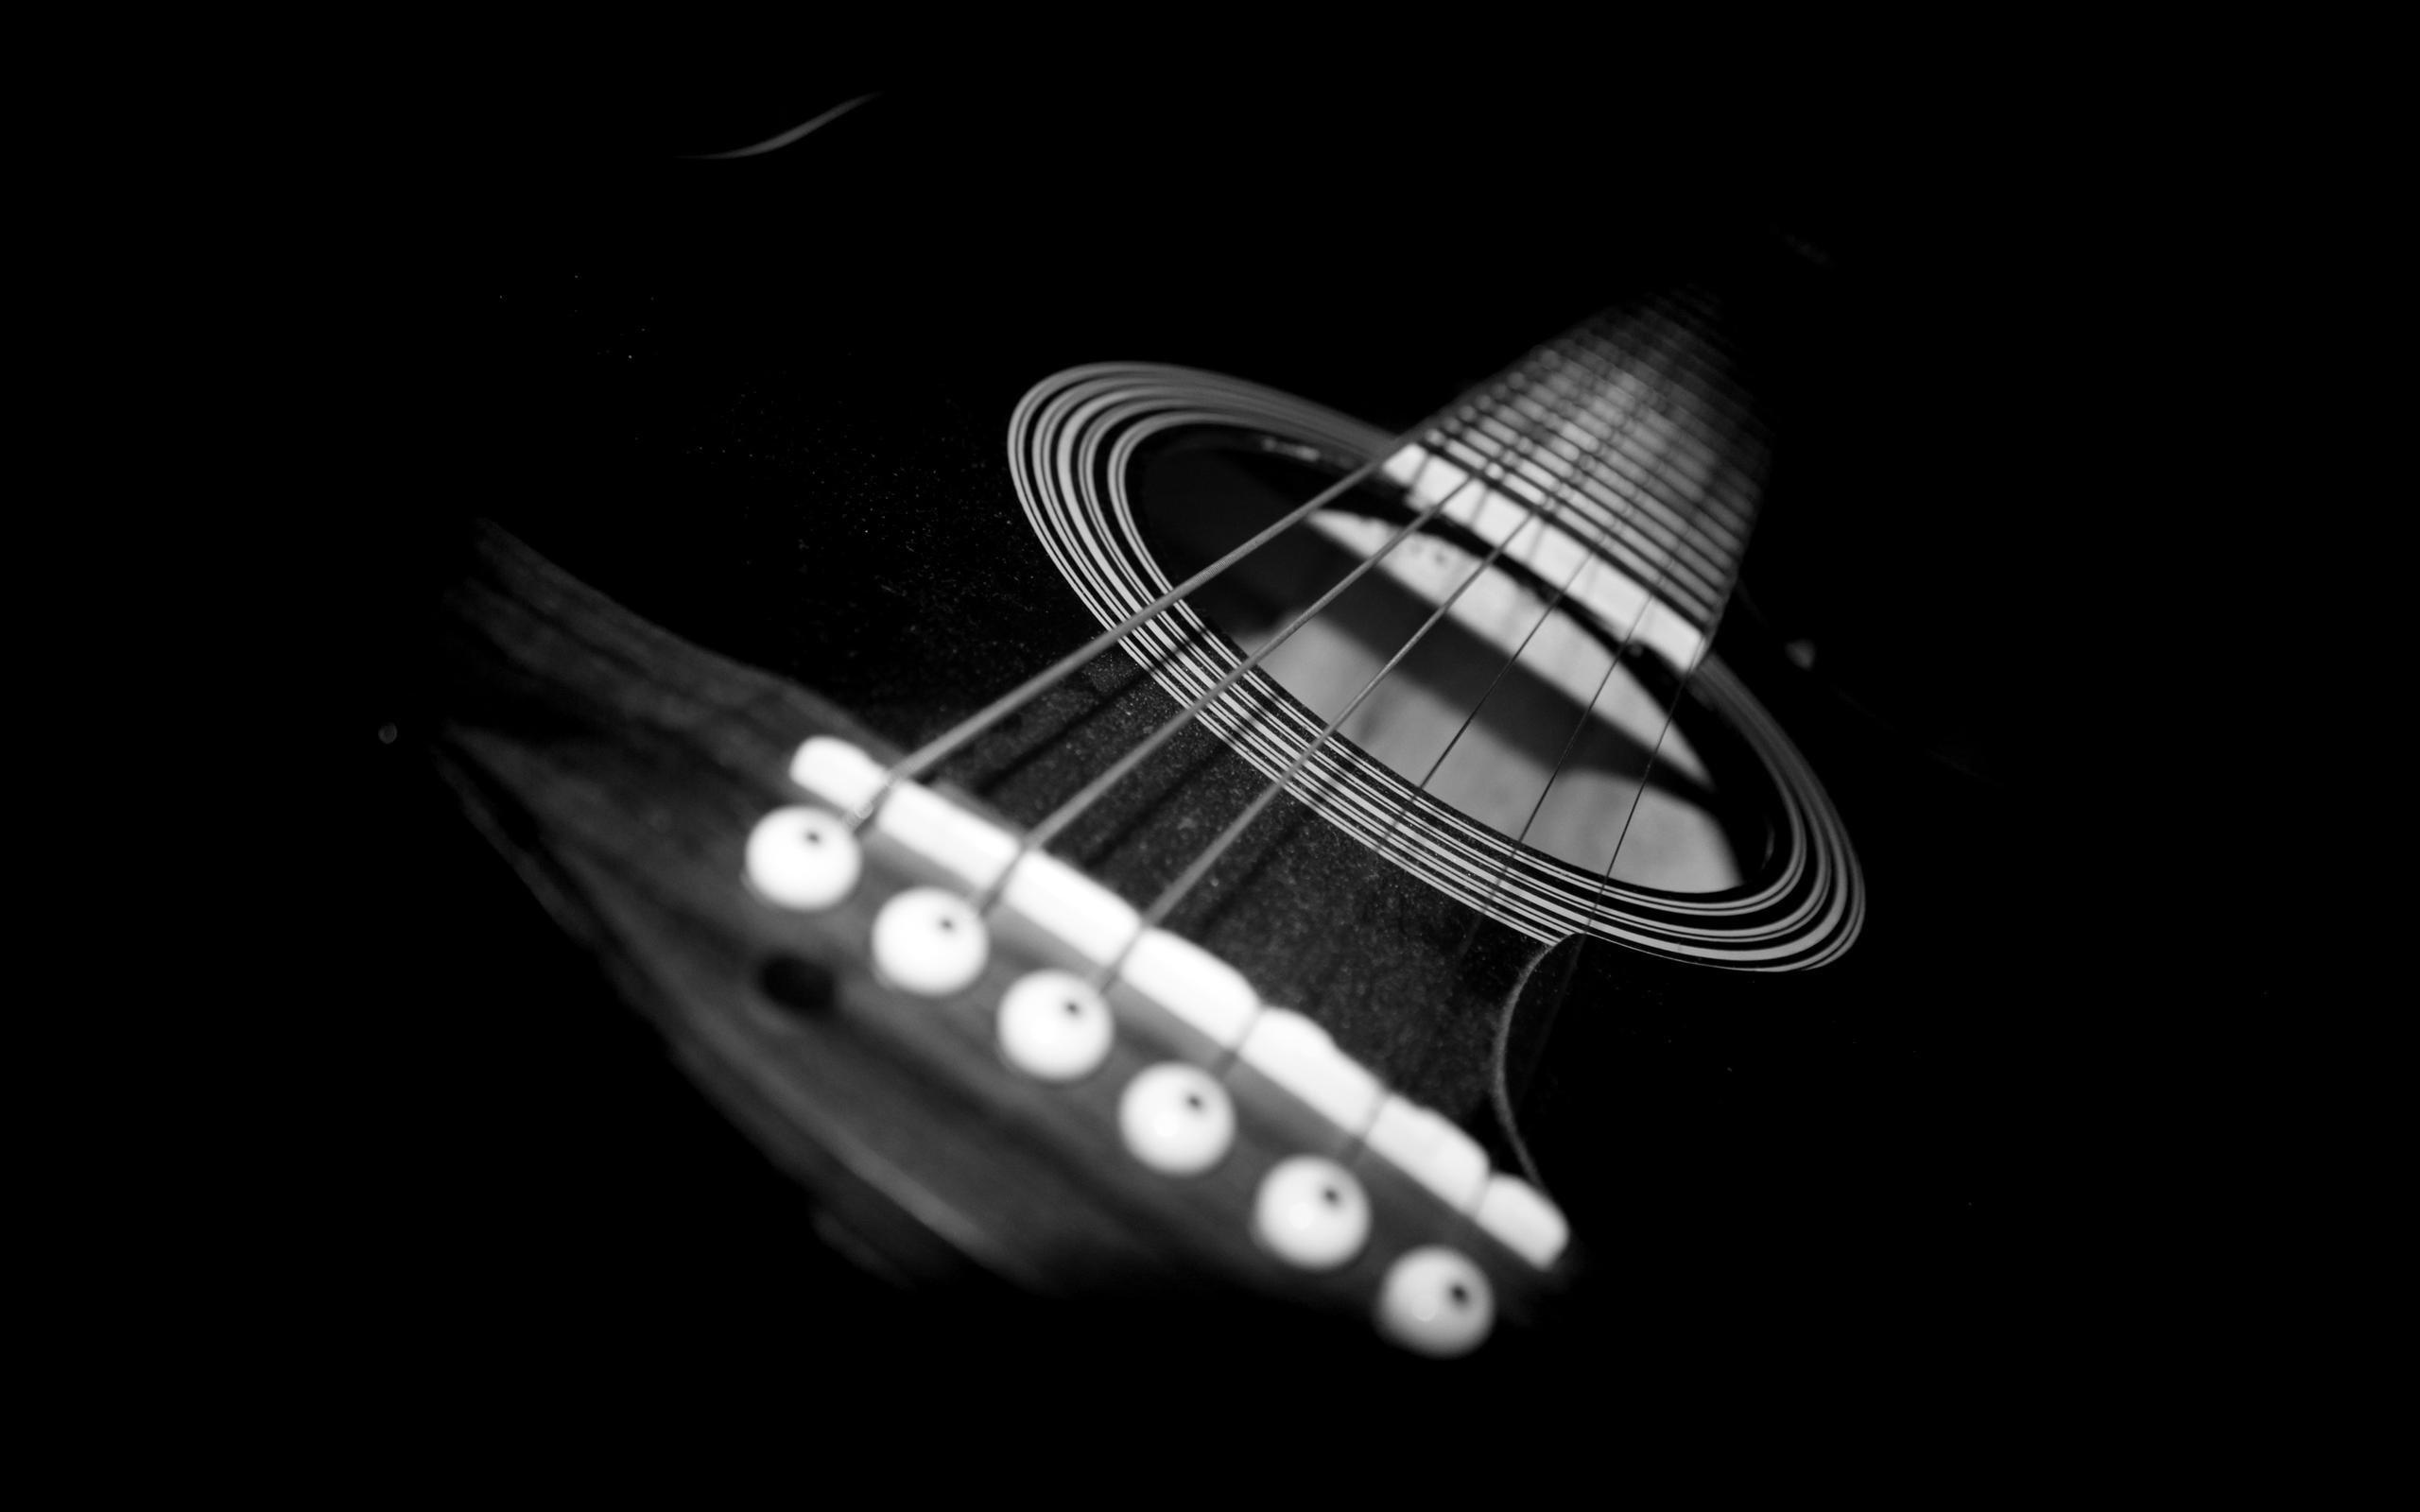 Glowing Guitar Wallpapers 7 | HD Wallpapers | Pinterest | Guitars and  Wallpaper